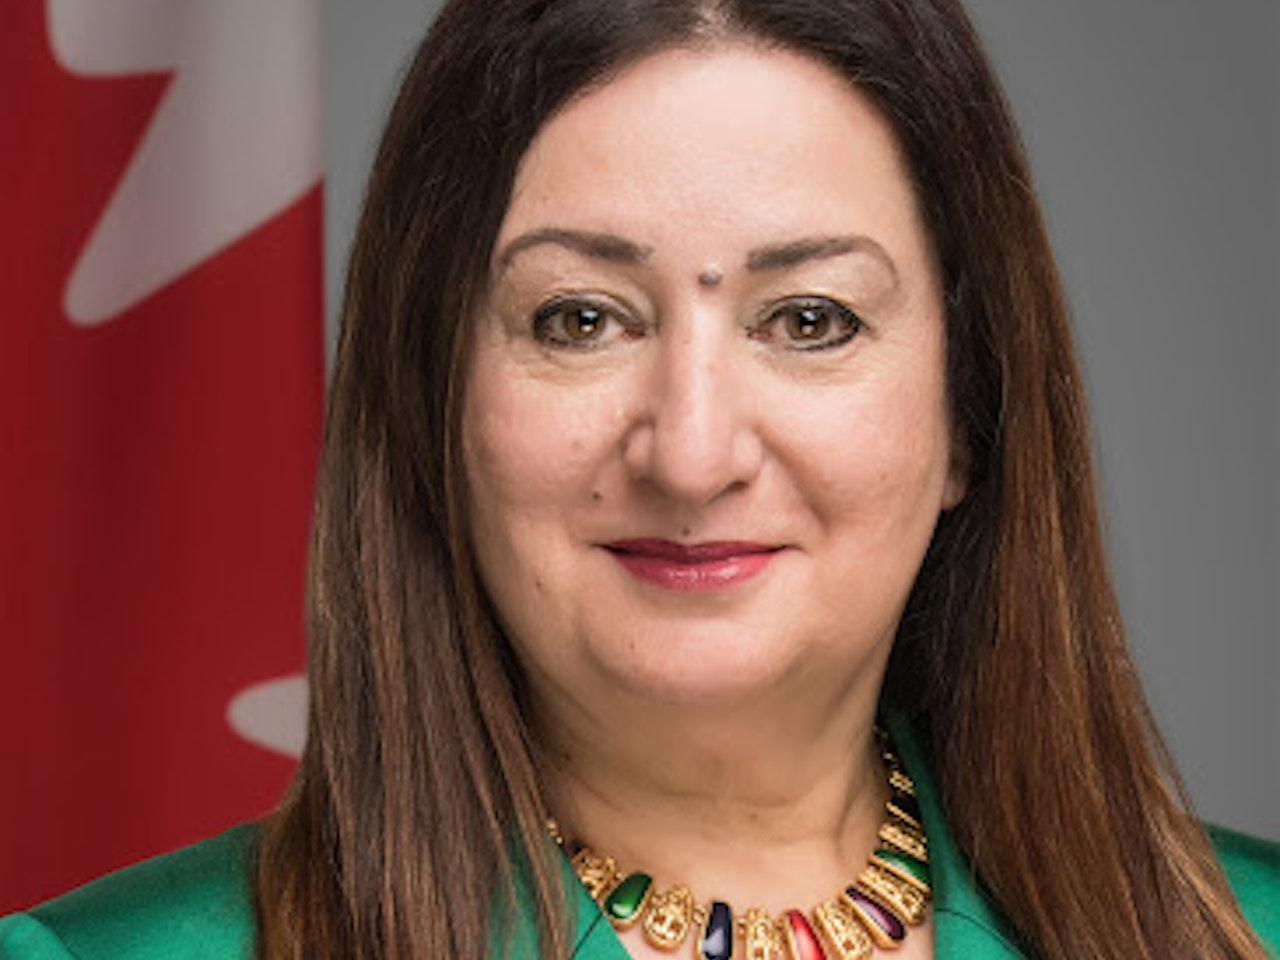 """Great Canadians"" Series - Hon. Senator Salma Ataullahjan Interview / Entrevue ""Canadiens Exceptionnels"" avec l'Hon. Sénatrice Salma Ataullahjan"